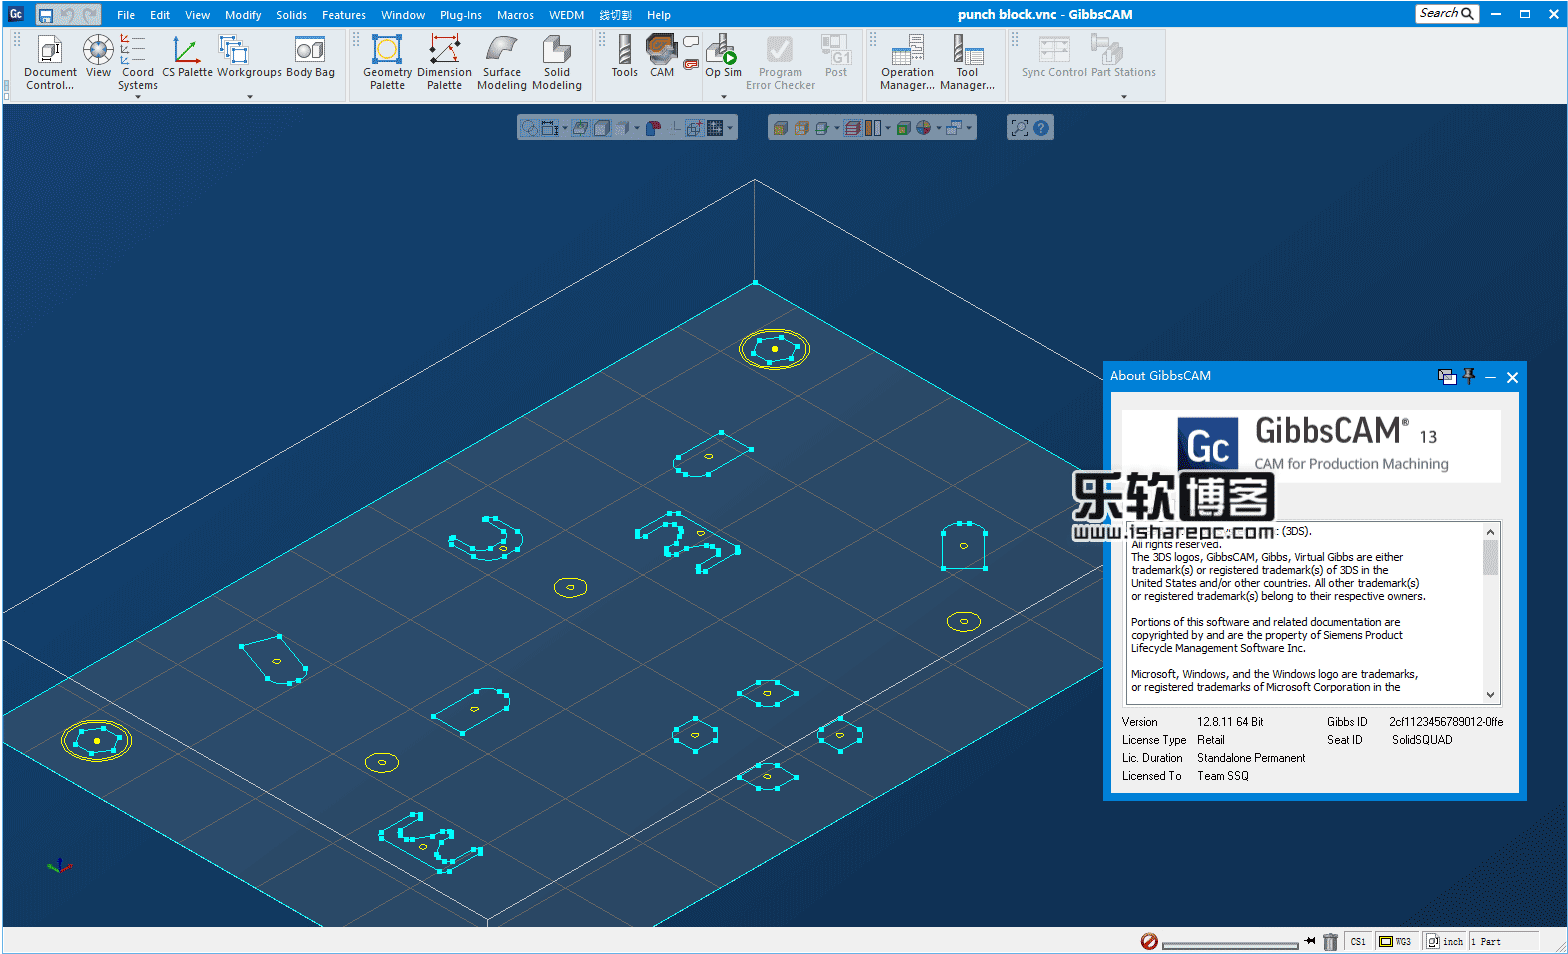 GibbsCAM 2018 v13 Build 12.8.11.0破解版